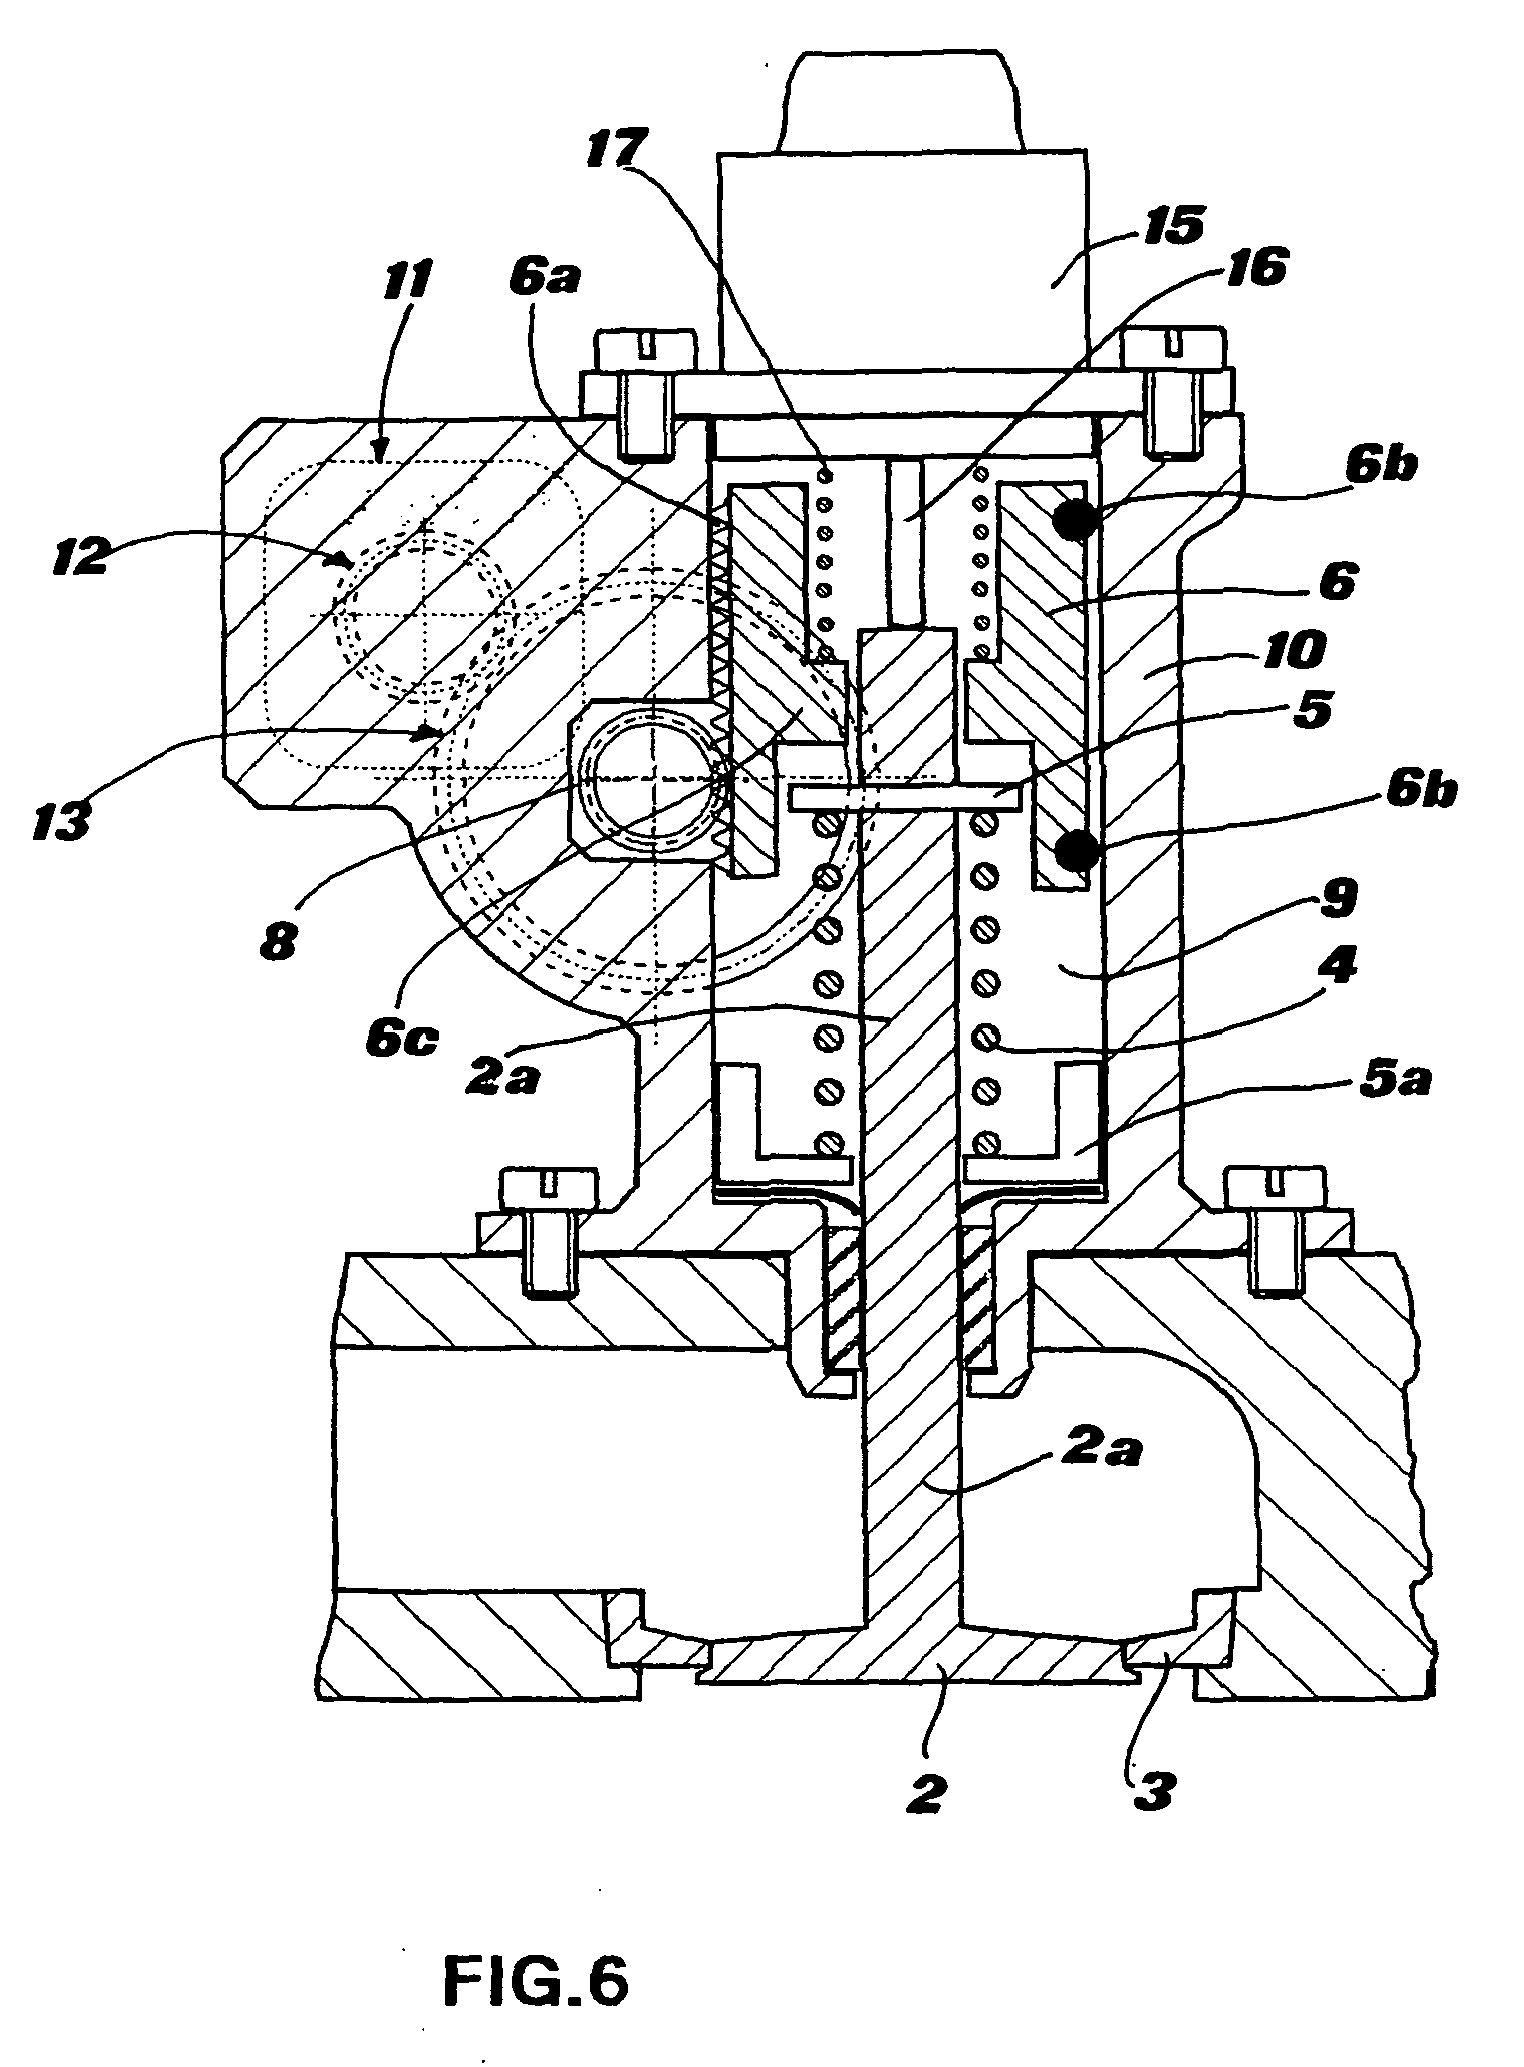 Tbi 350 Egr Vacuum Diagram - All Diagram Schematics